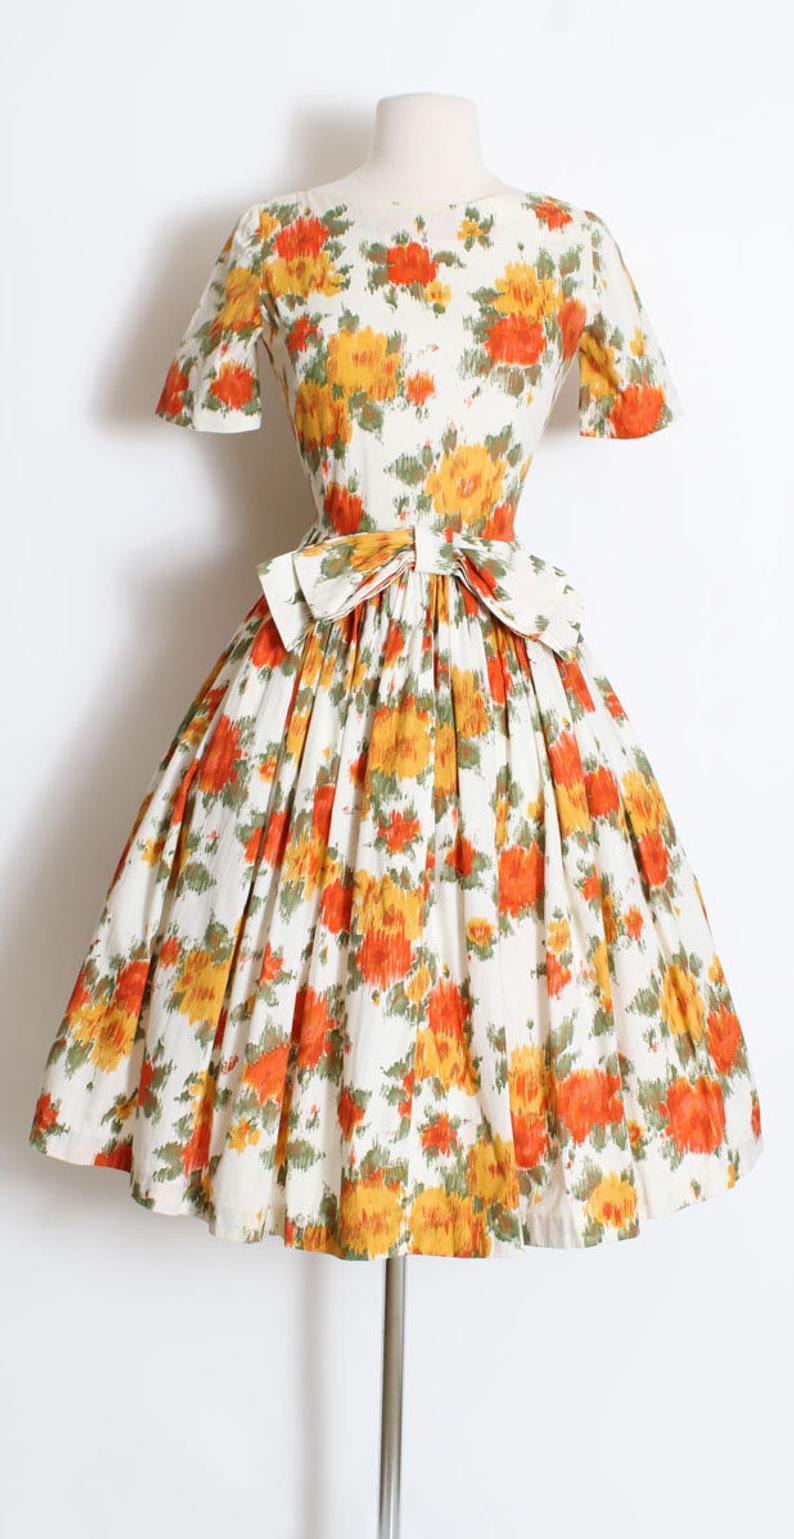 Vintage 1950s 50s Dress Orange Yellow Autumn Rose Print Cotton Dress S M Small Medium S M 50s Dresses Vintage Dresses 50s Printed Cotton Dress [ 1539 x 794 Pixel ]